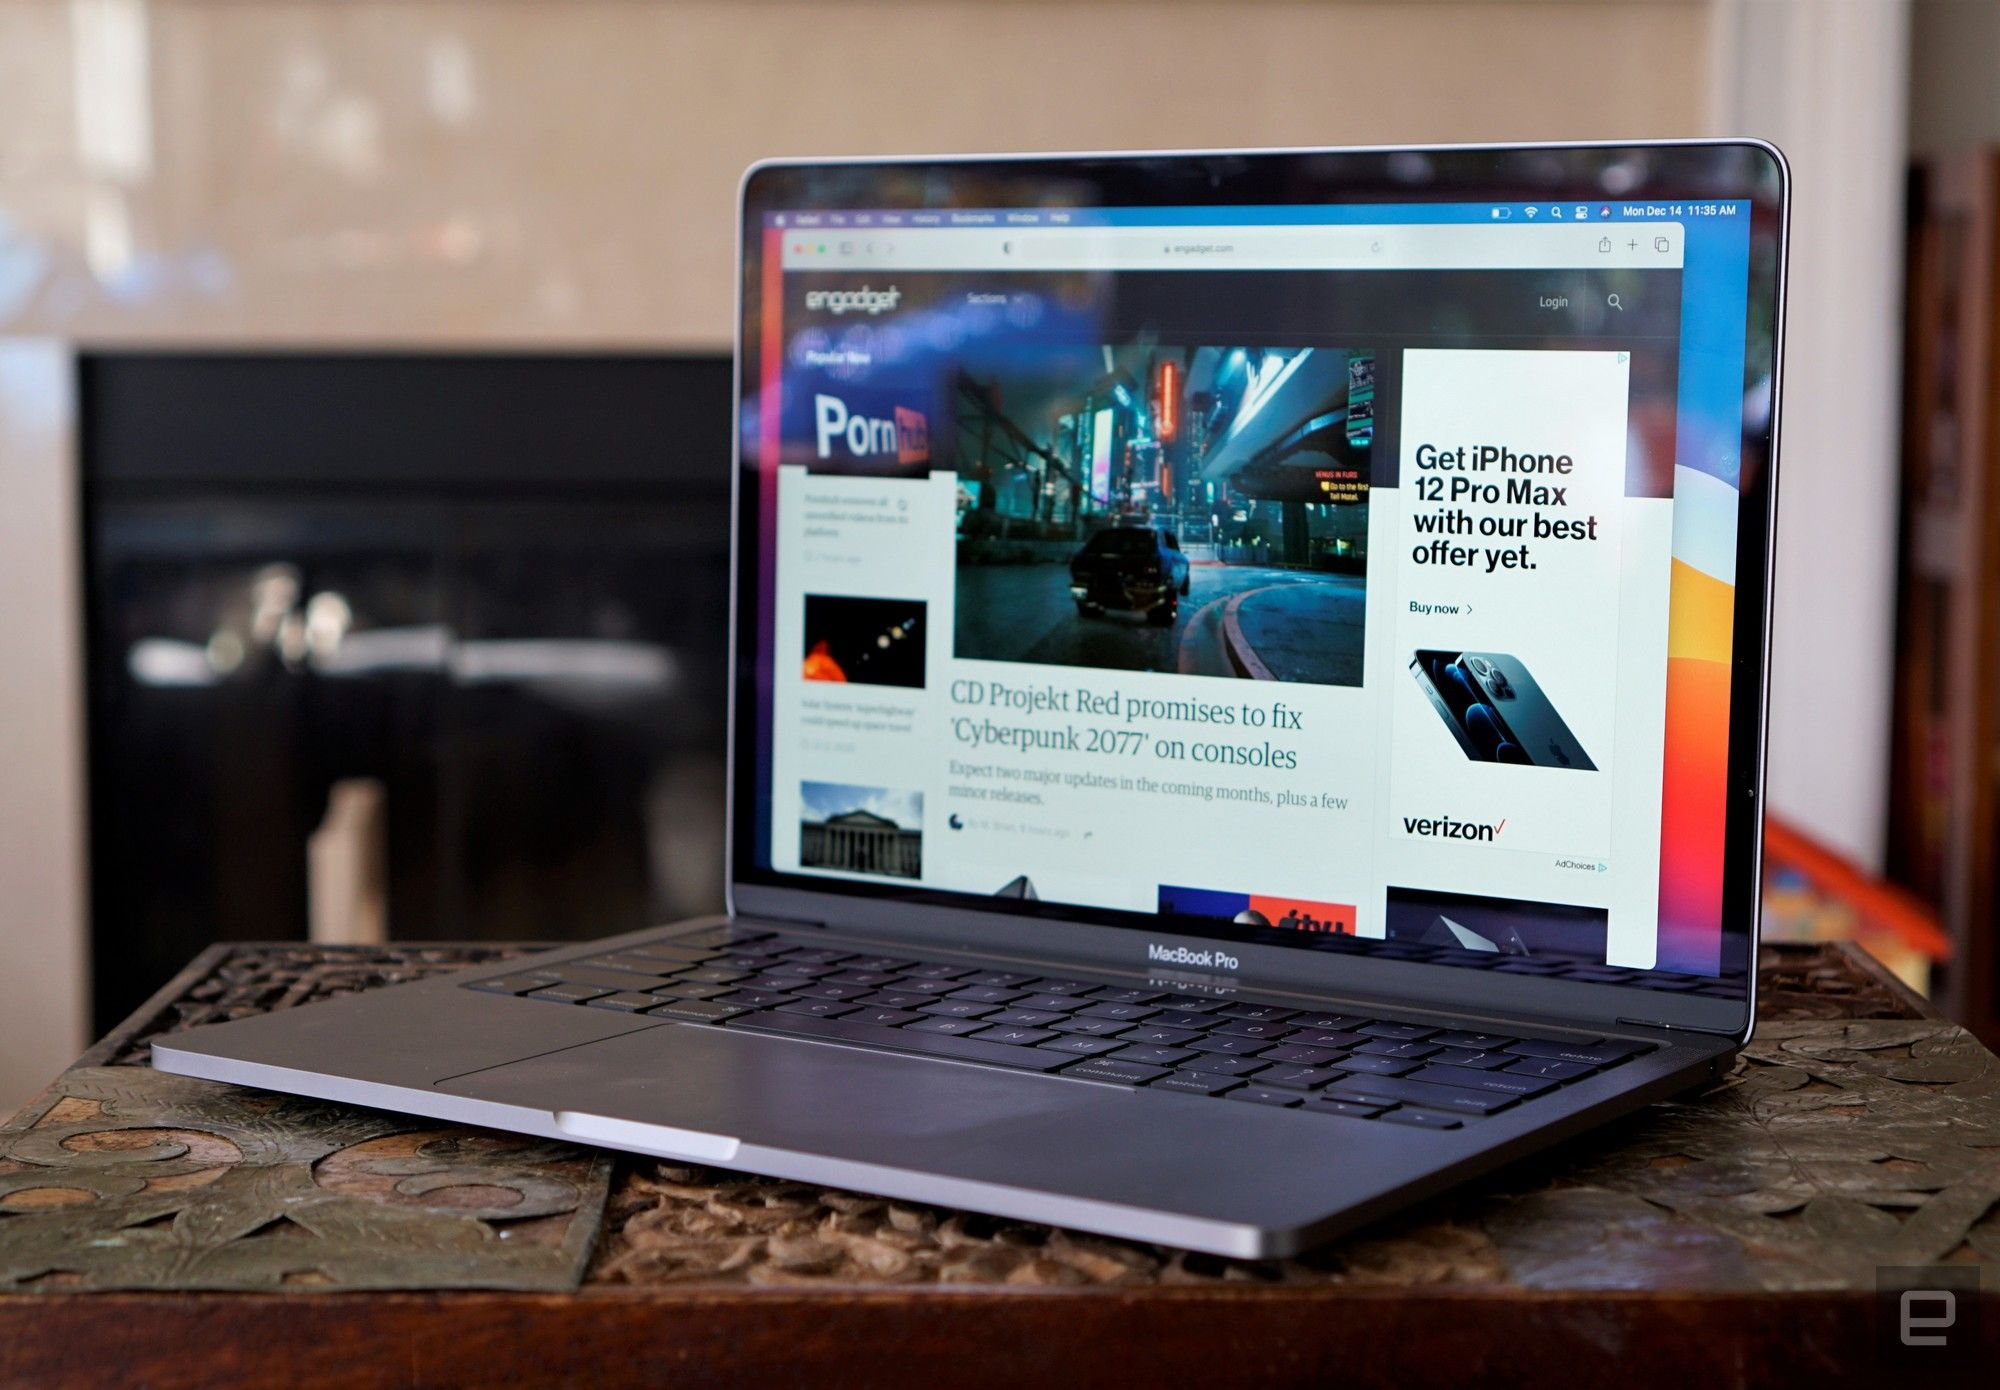 Amazon knocks $80 off Apple's MacBook Pro M1 – Yahoo Finance Australia